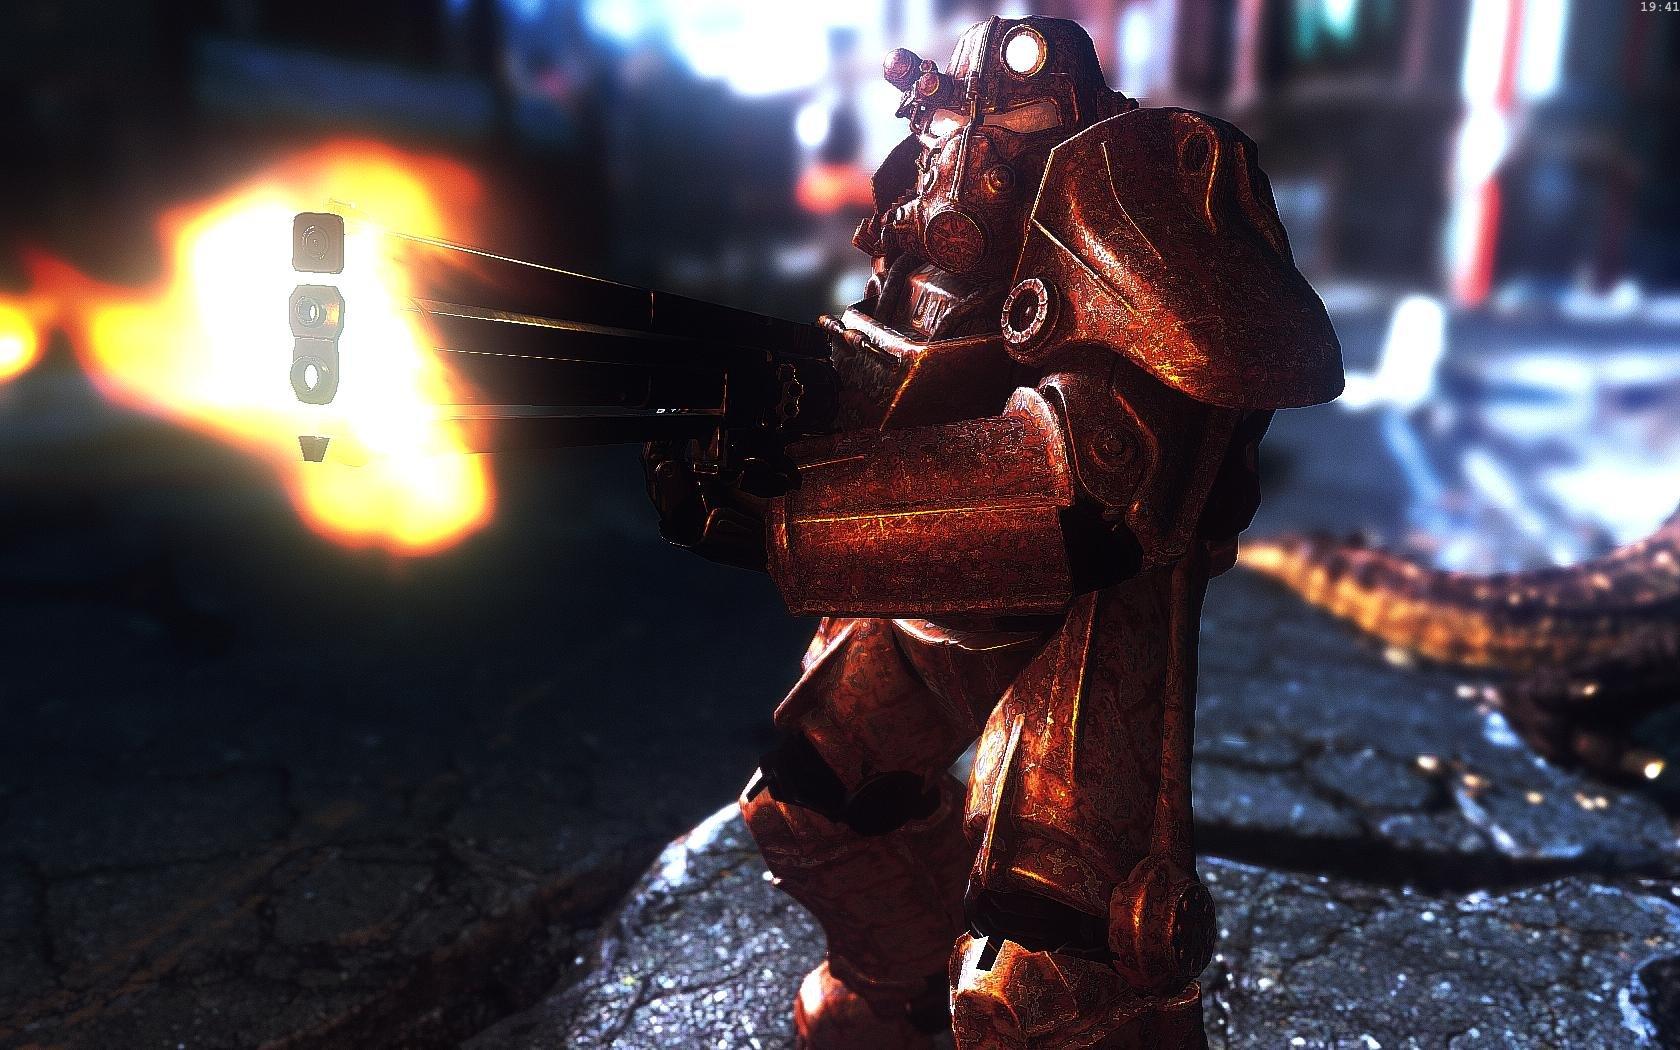 Fallout4 2019-01-17 19-41-19-05